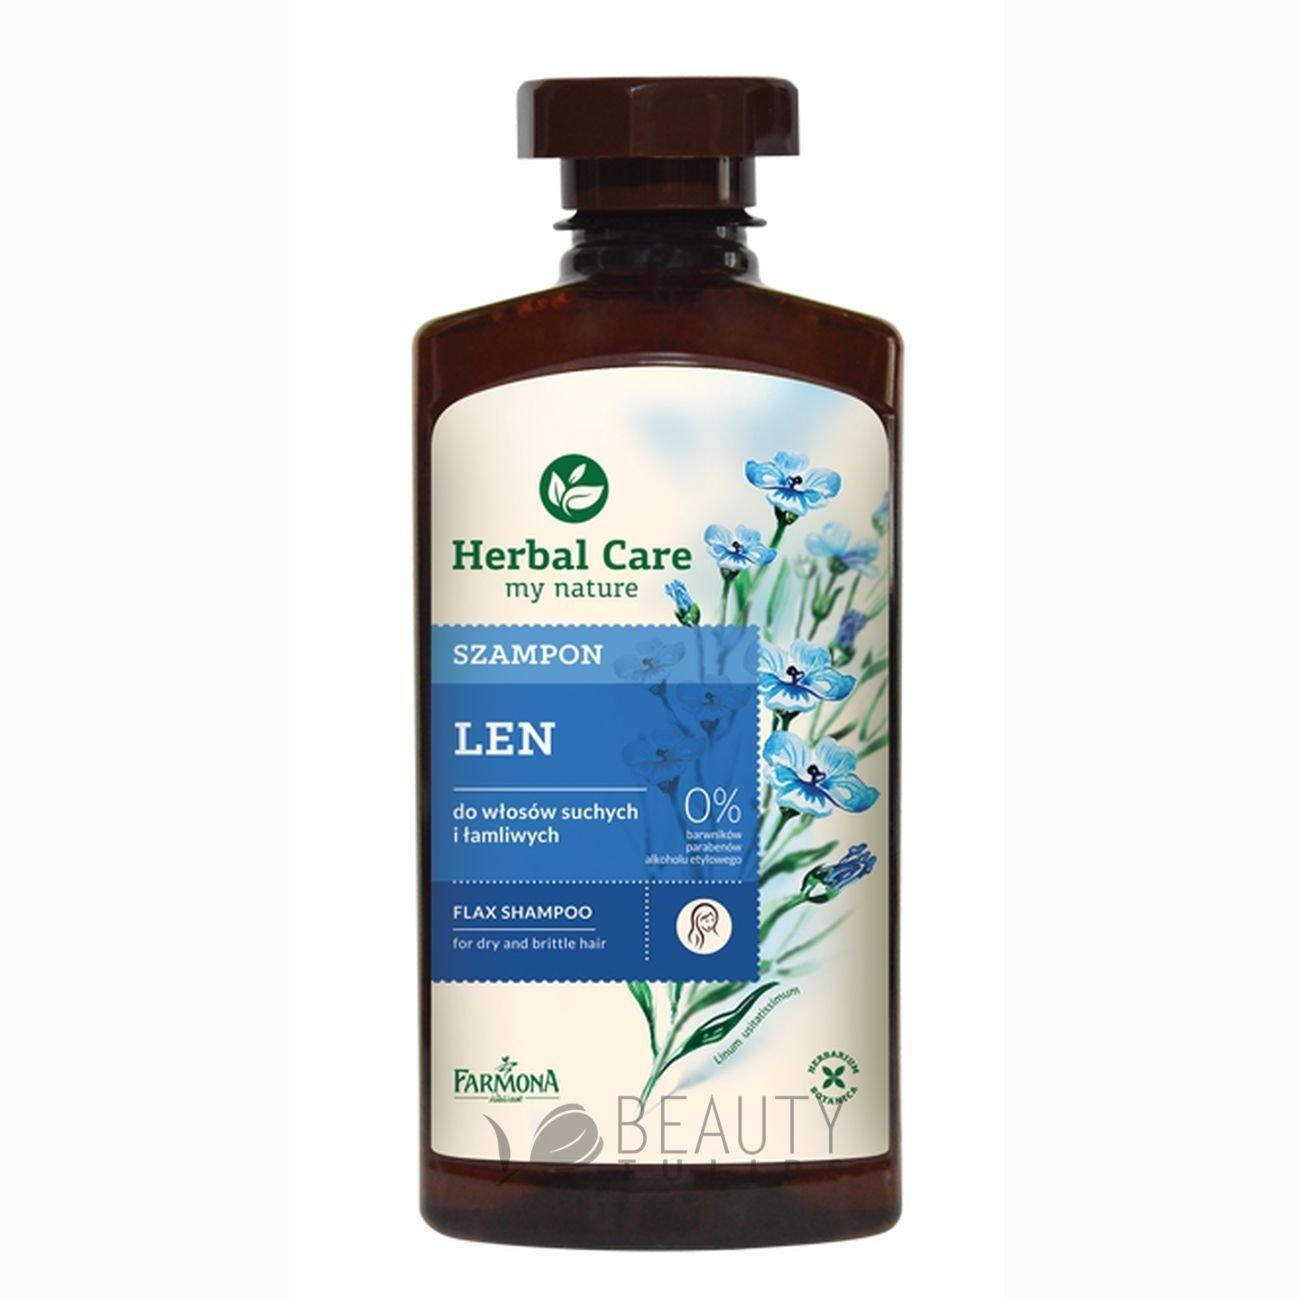 Farmona Herbal Care My Nature Flax Shampoo 330ml